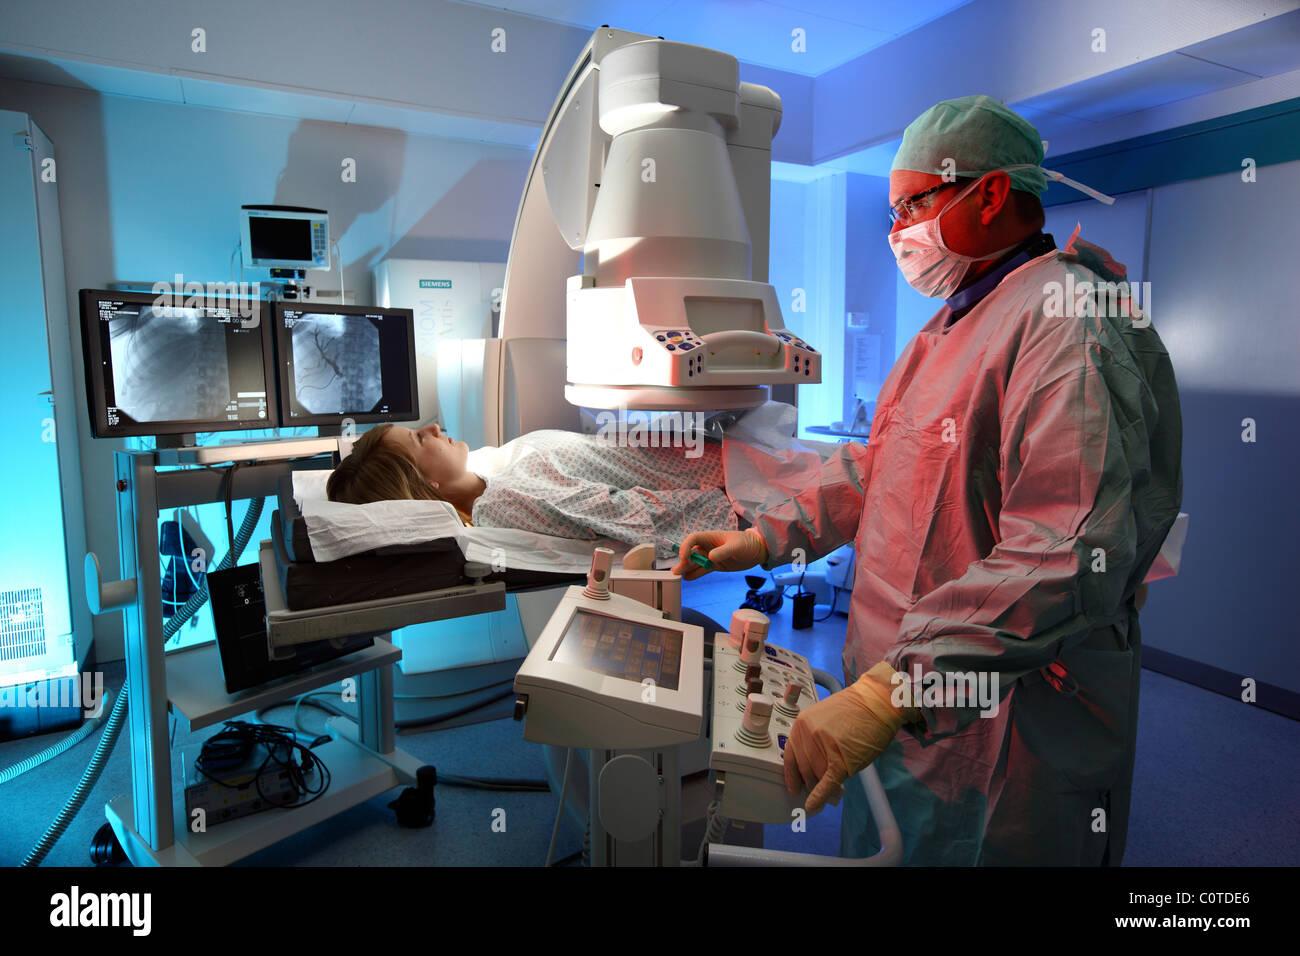 Hospital, diagnostic radiology. Angiography. - Stock Image